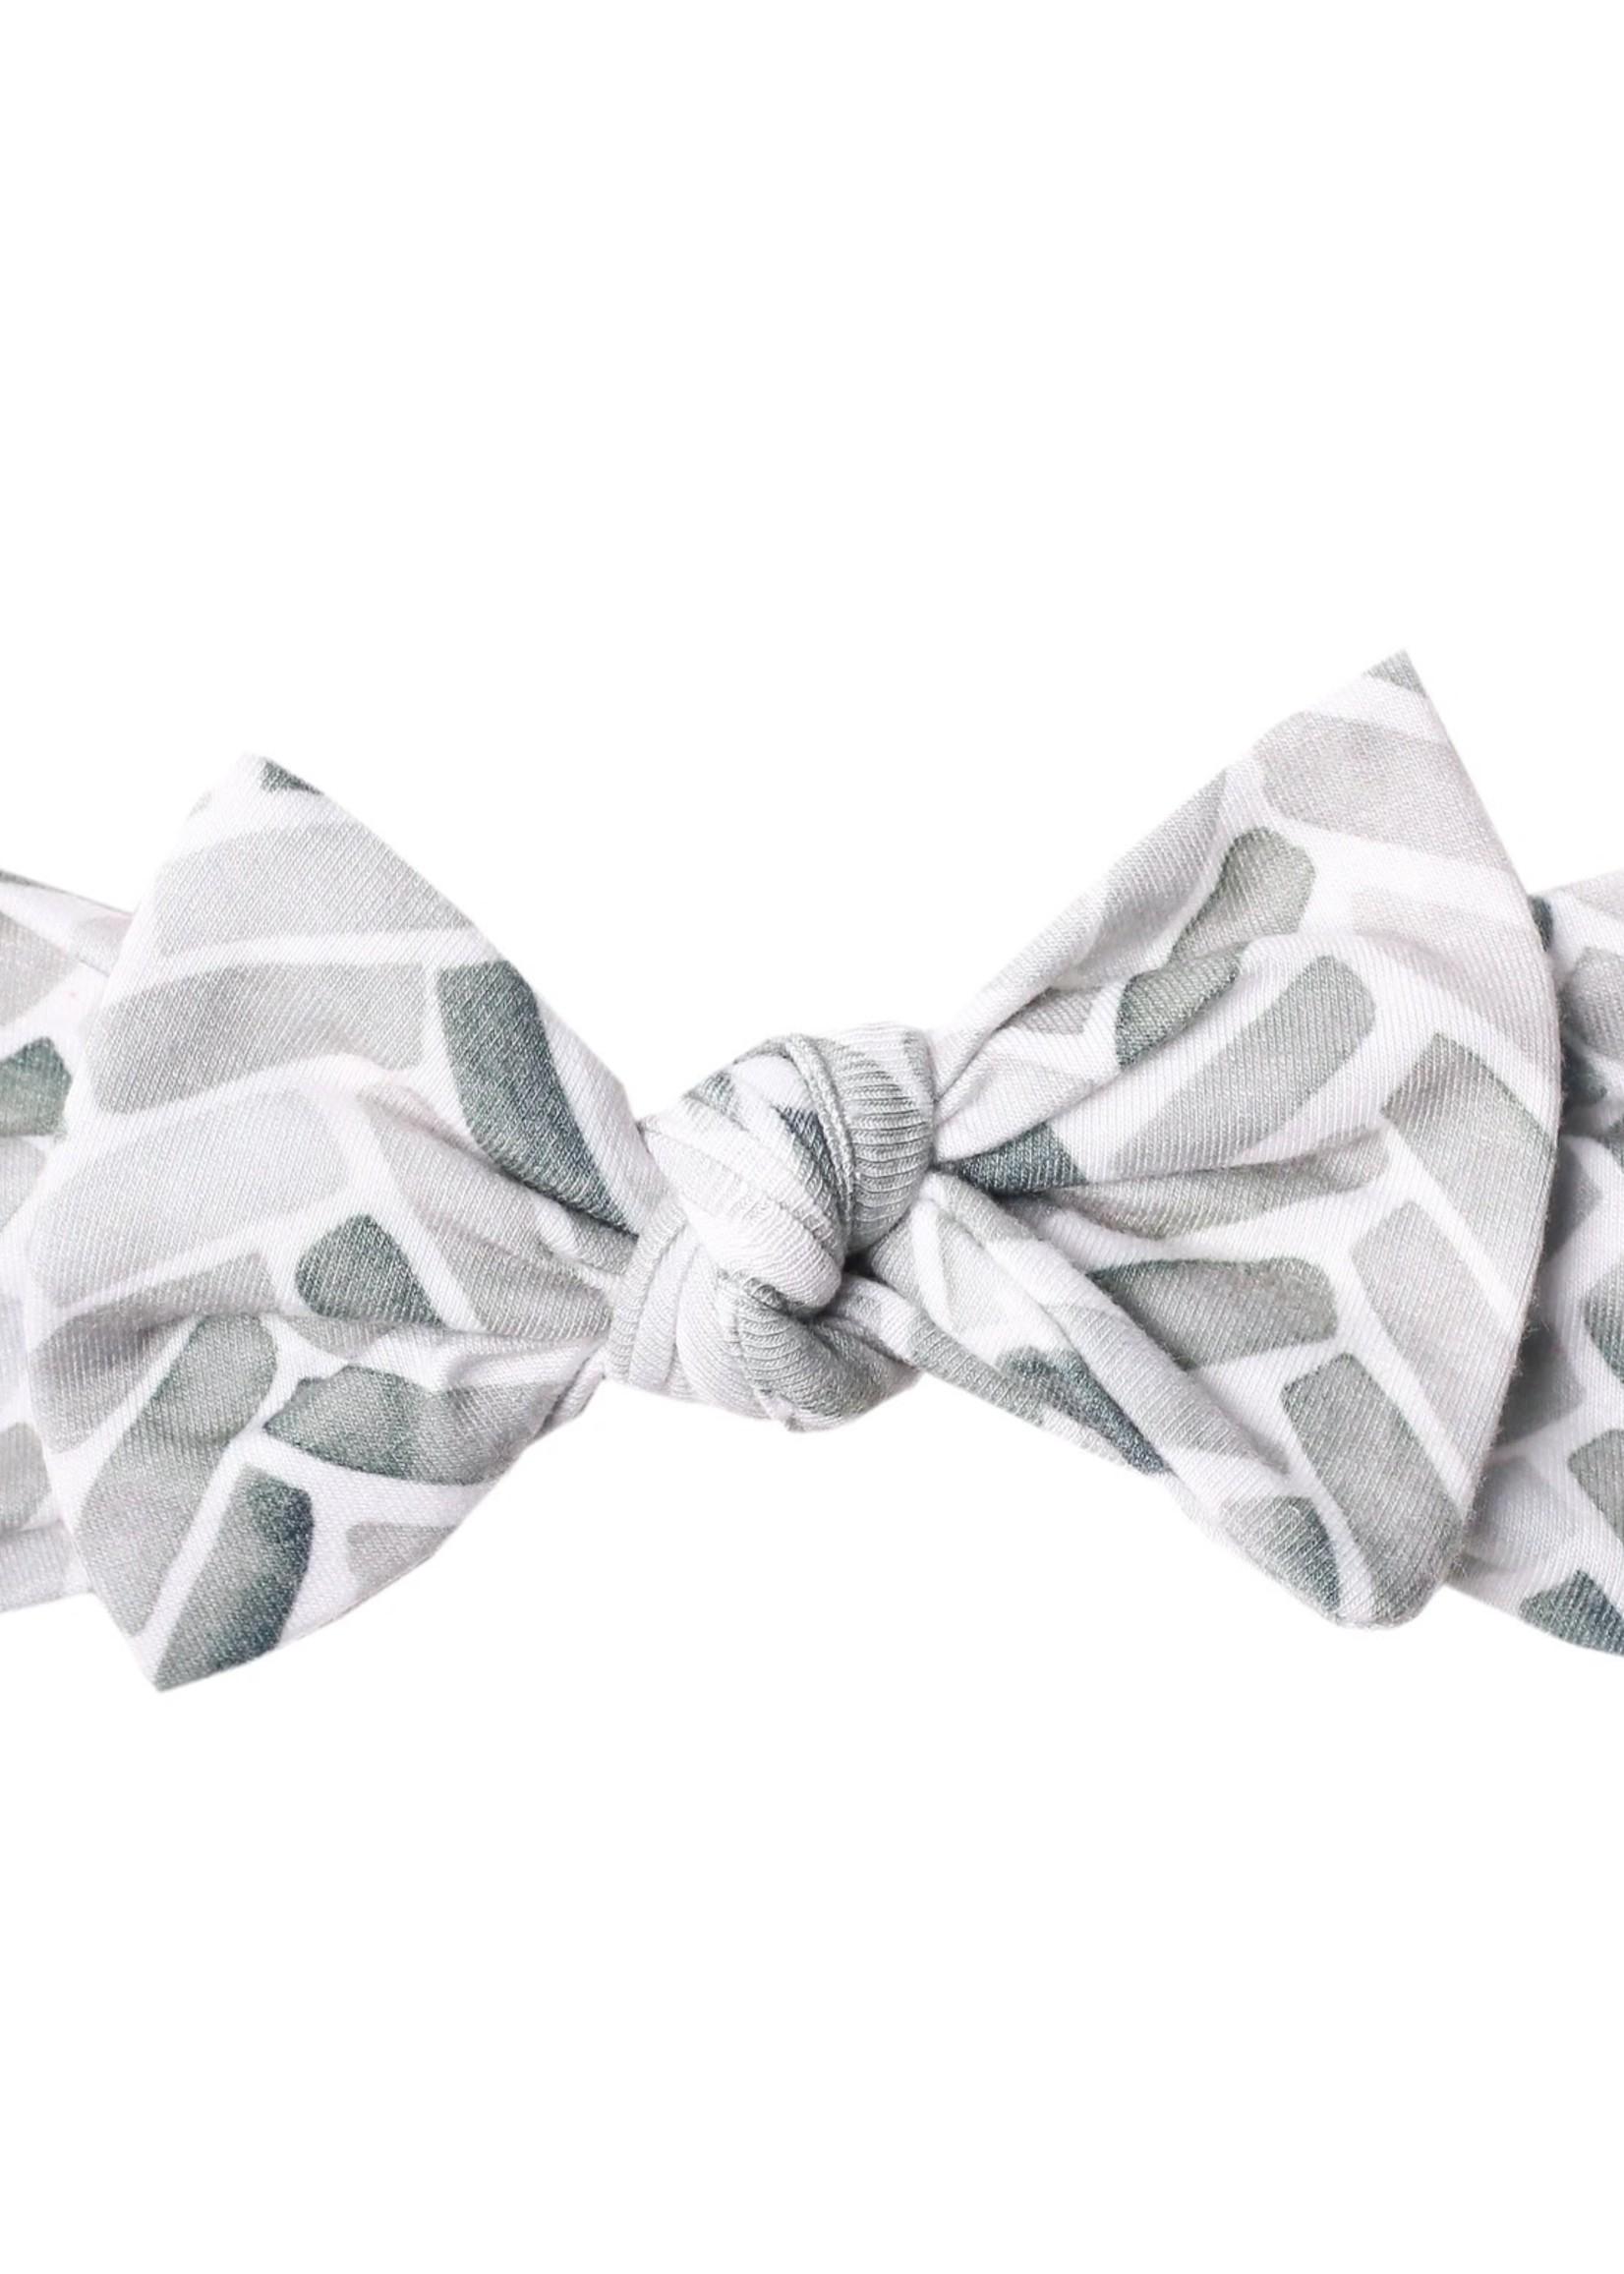 COPPER PEARL Knit Headband Bow ALTA